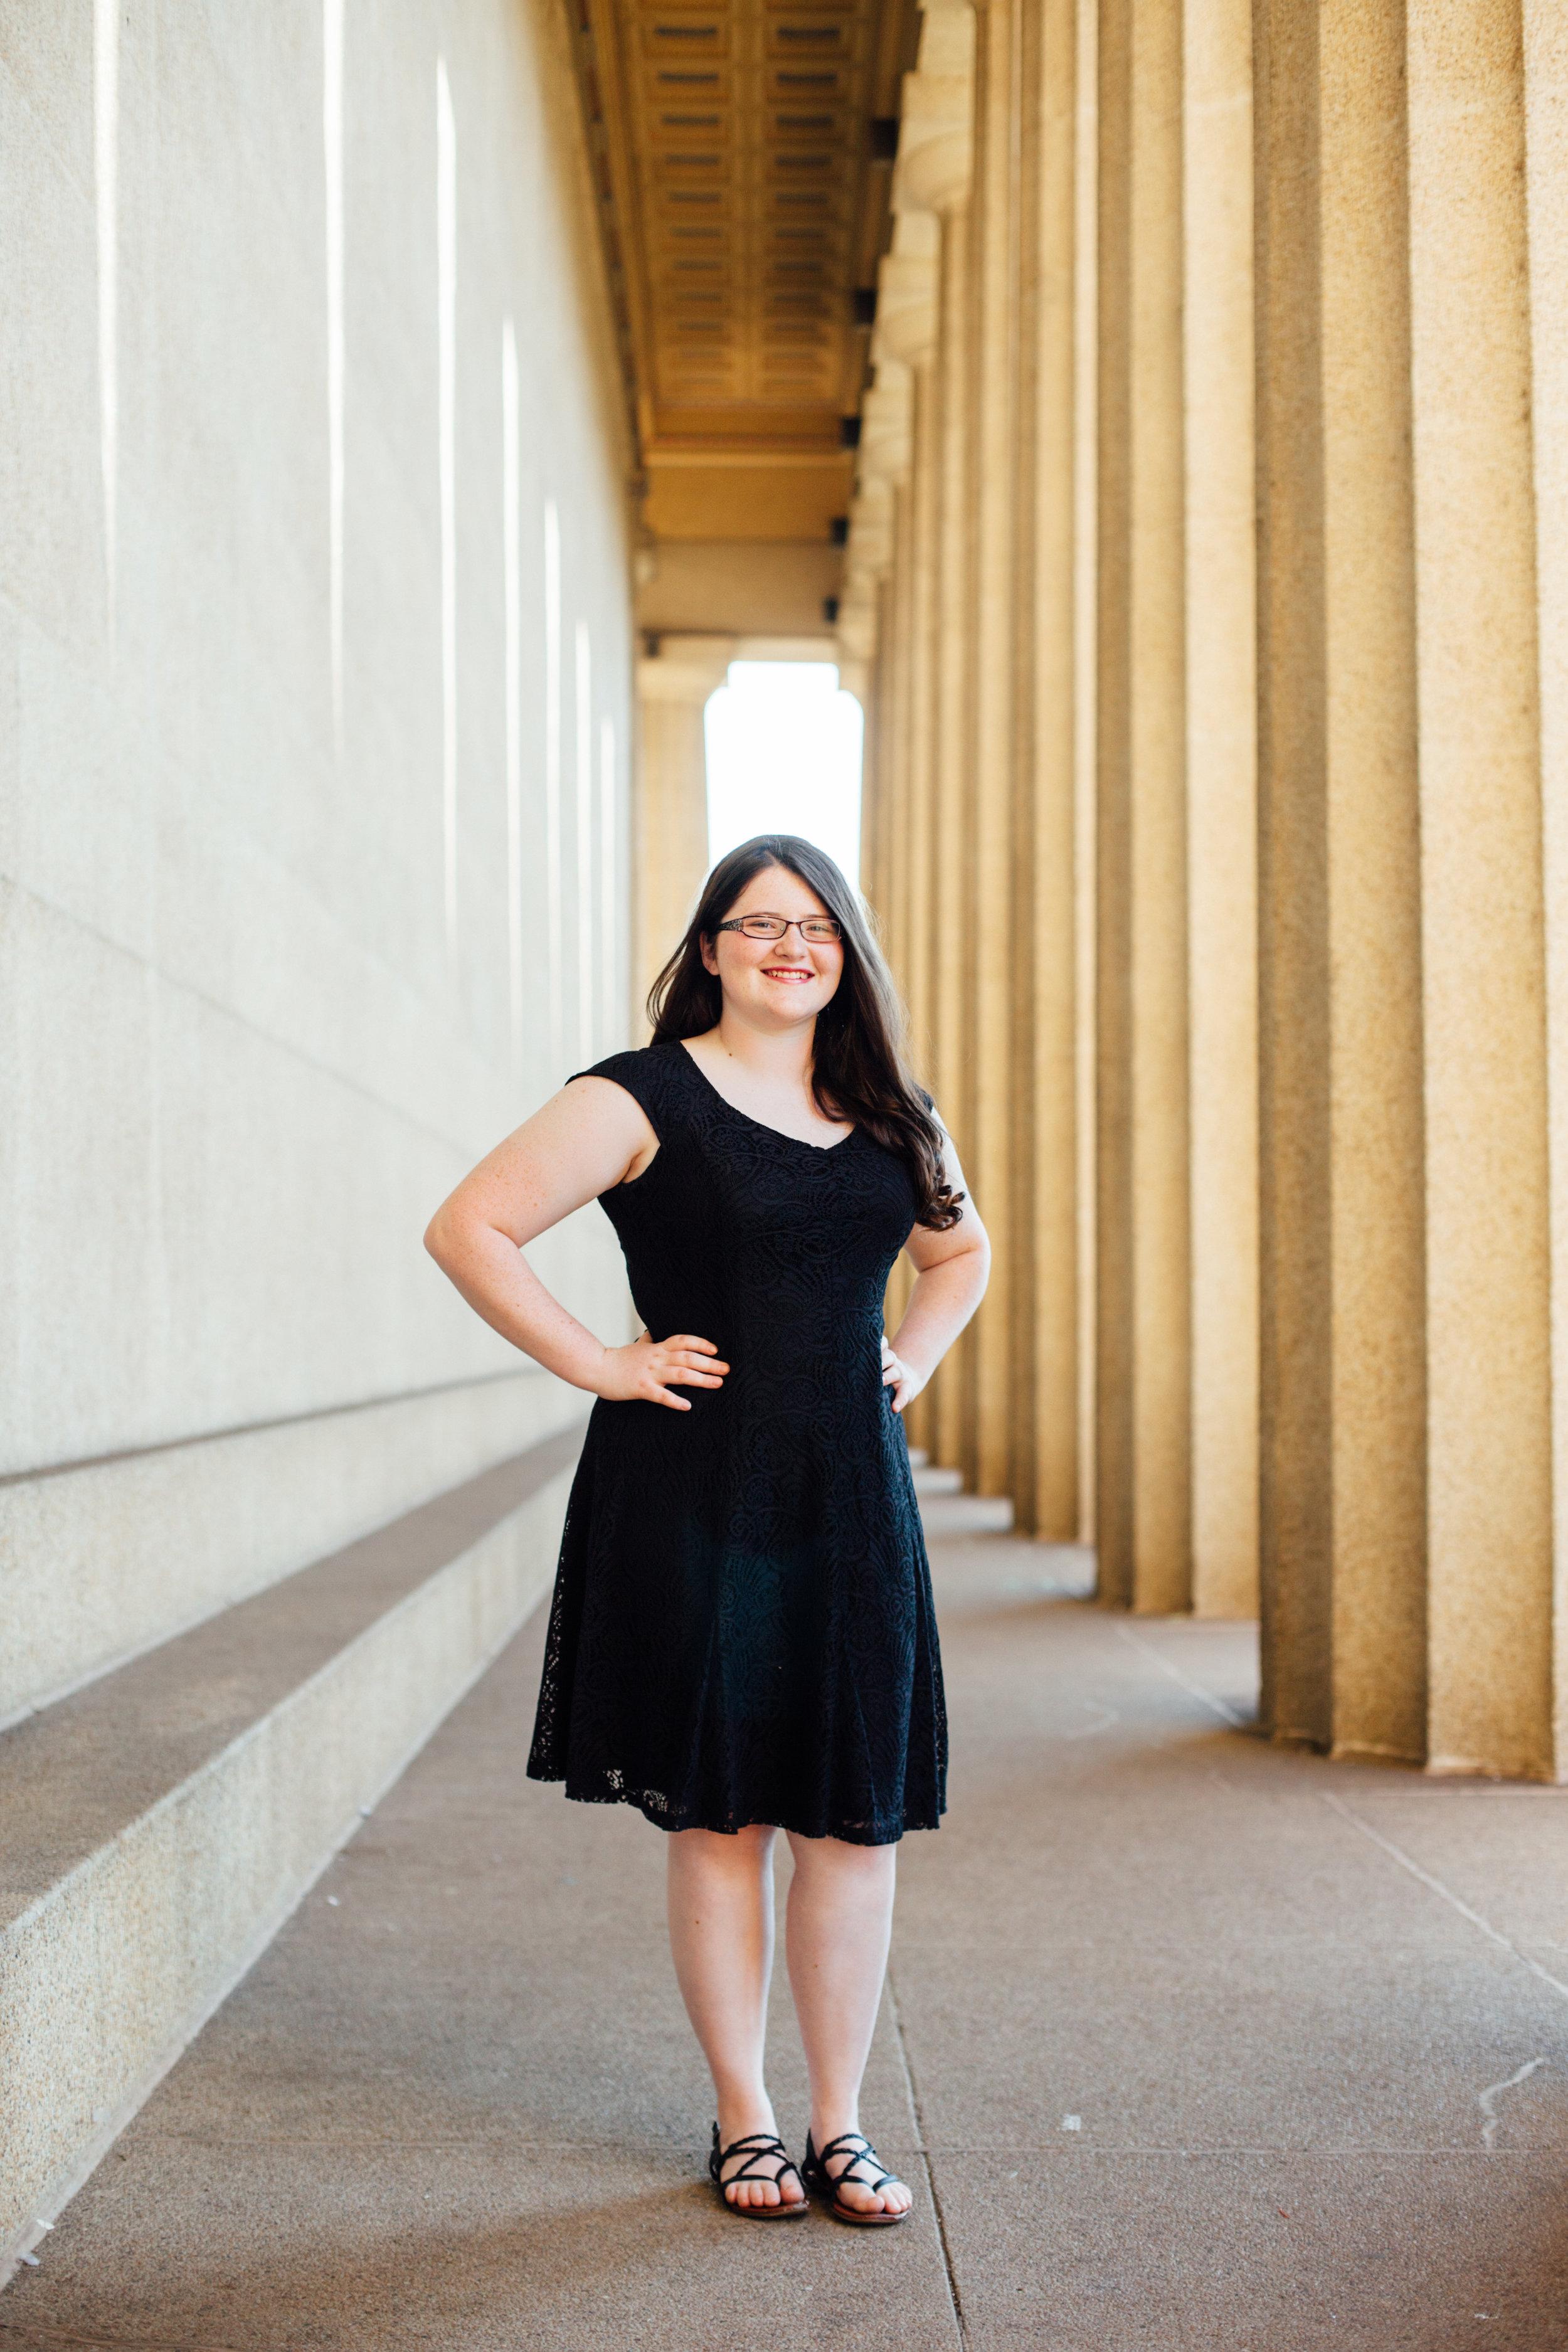 Senior-Lucy-McGee-0162.jpg